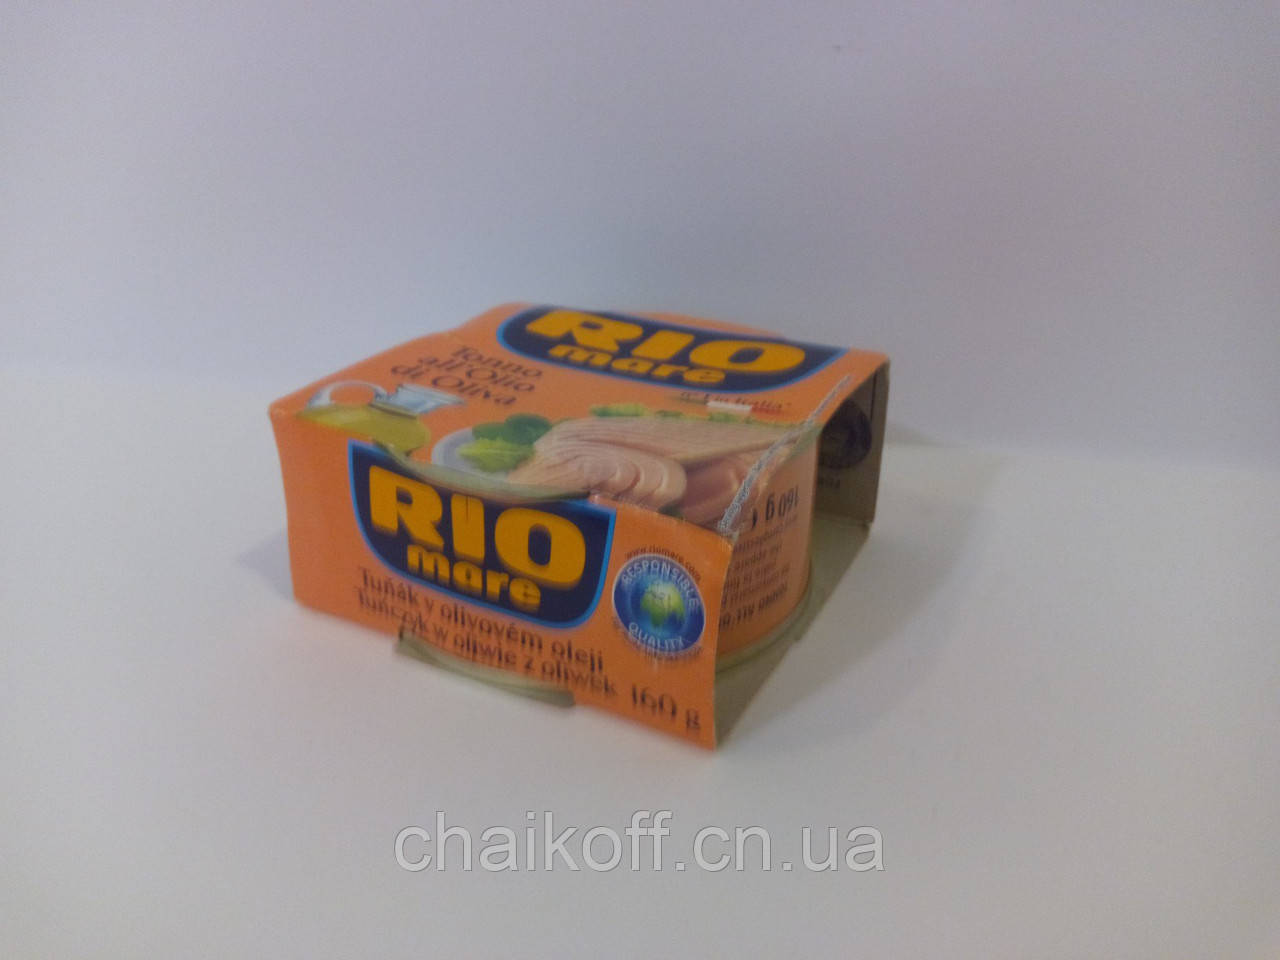 Тунець в оливковому  маслі RIO Mare Tonno all'Olio di Oliva 160g (шт.)